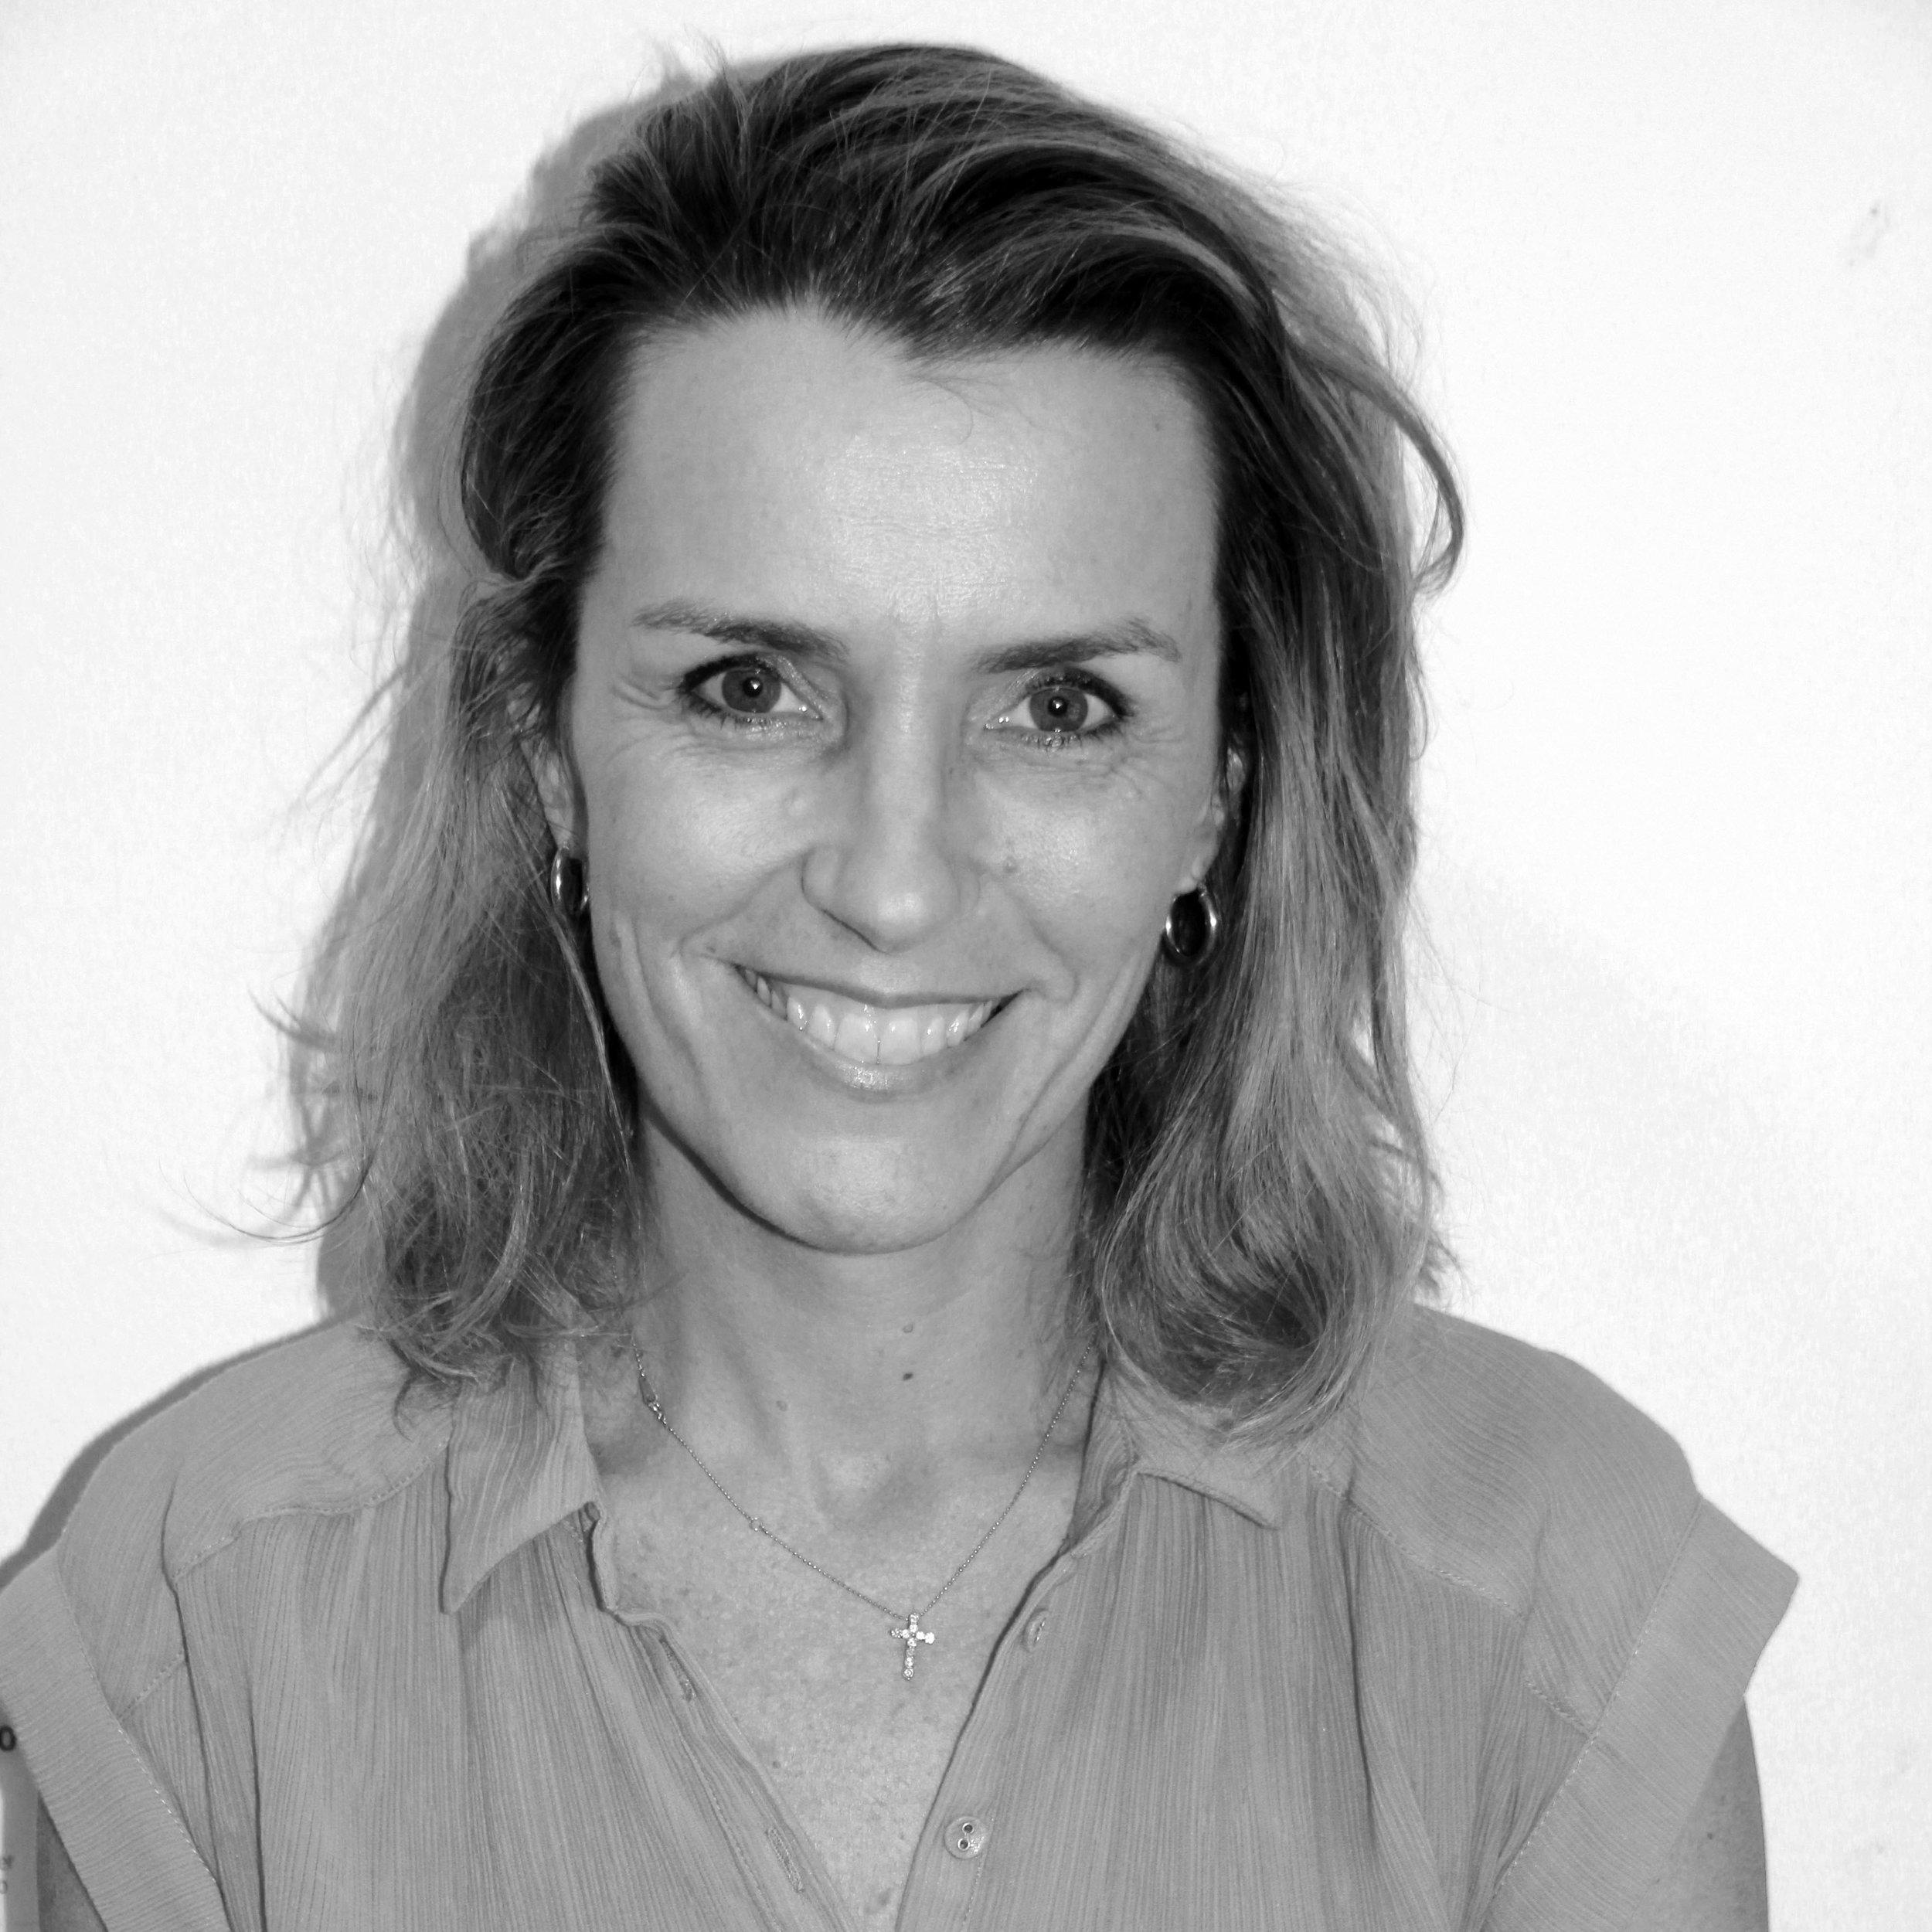 Amanda Osborne